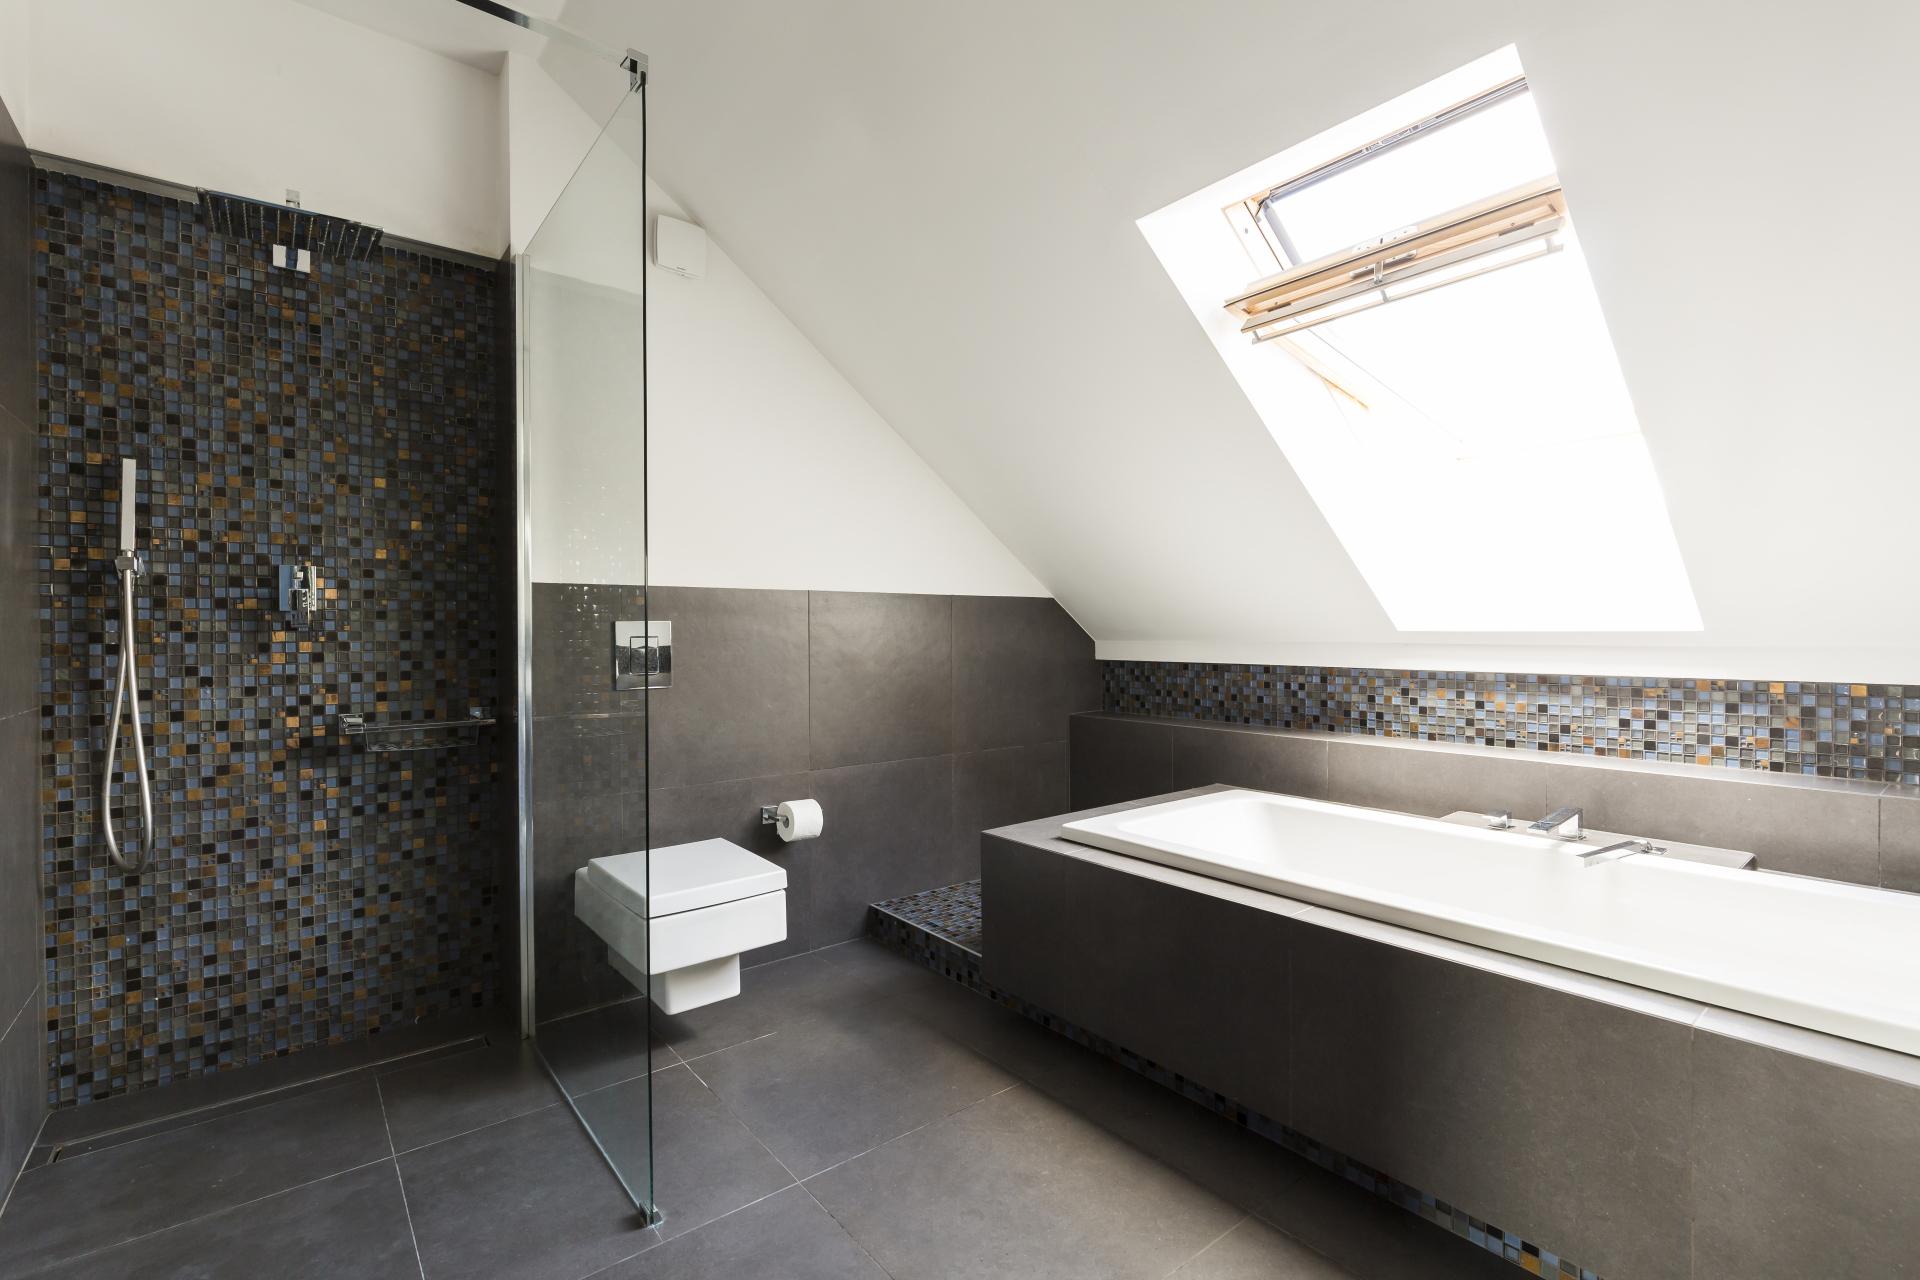 konz meisterbetrieb fliesenleger waibling fliesenleger fellbach. Black Bedroom Furniture Sets. Home Design Ideas